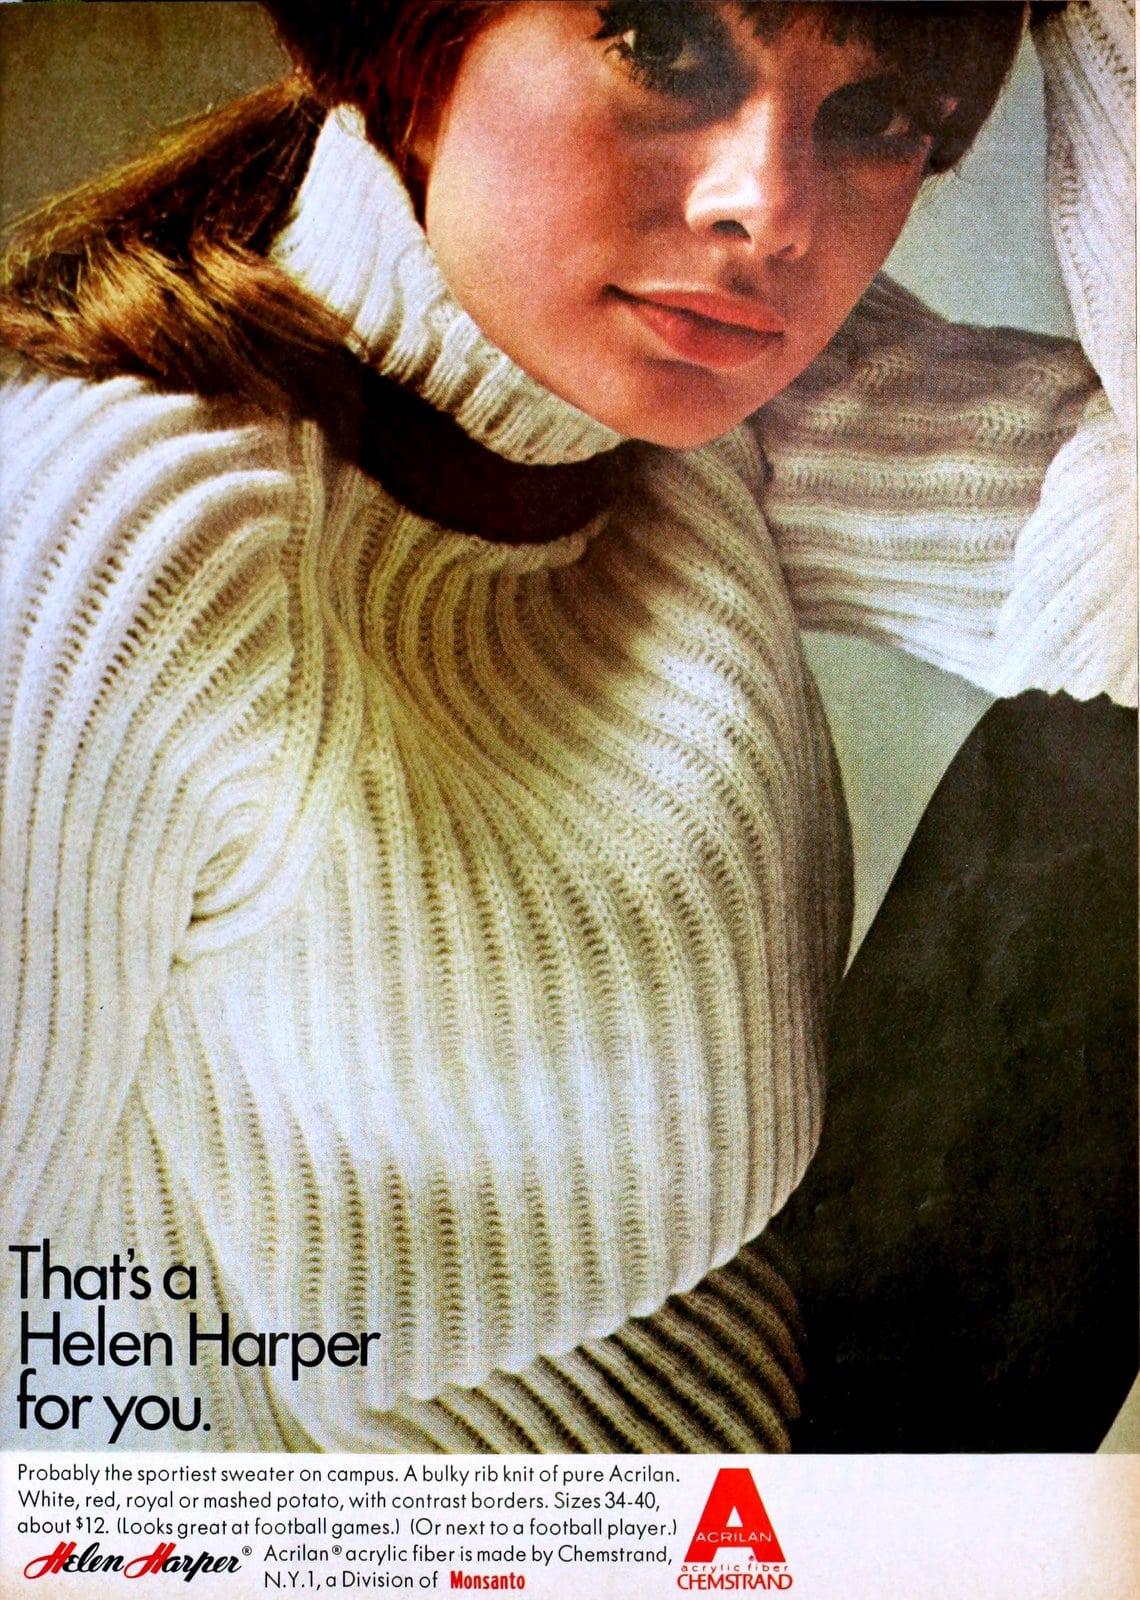 White turtleneck sweater from Helen Harper (1964)